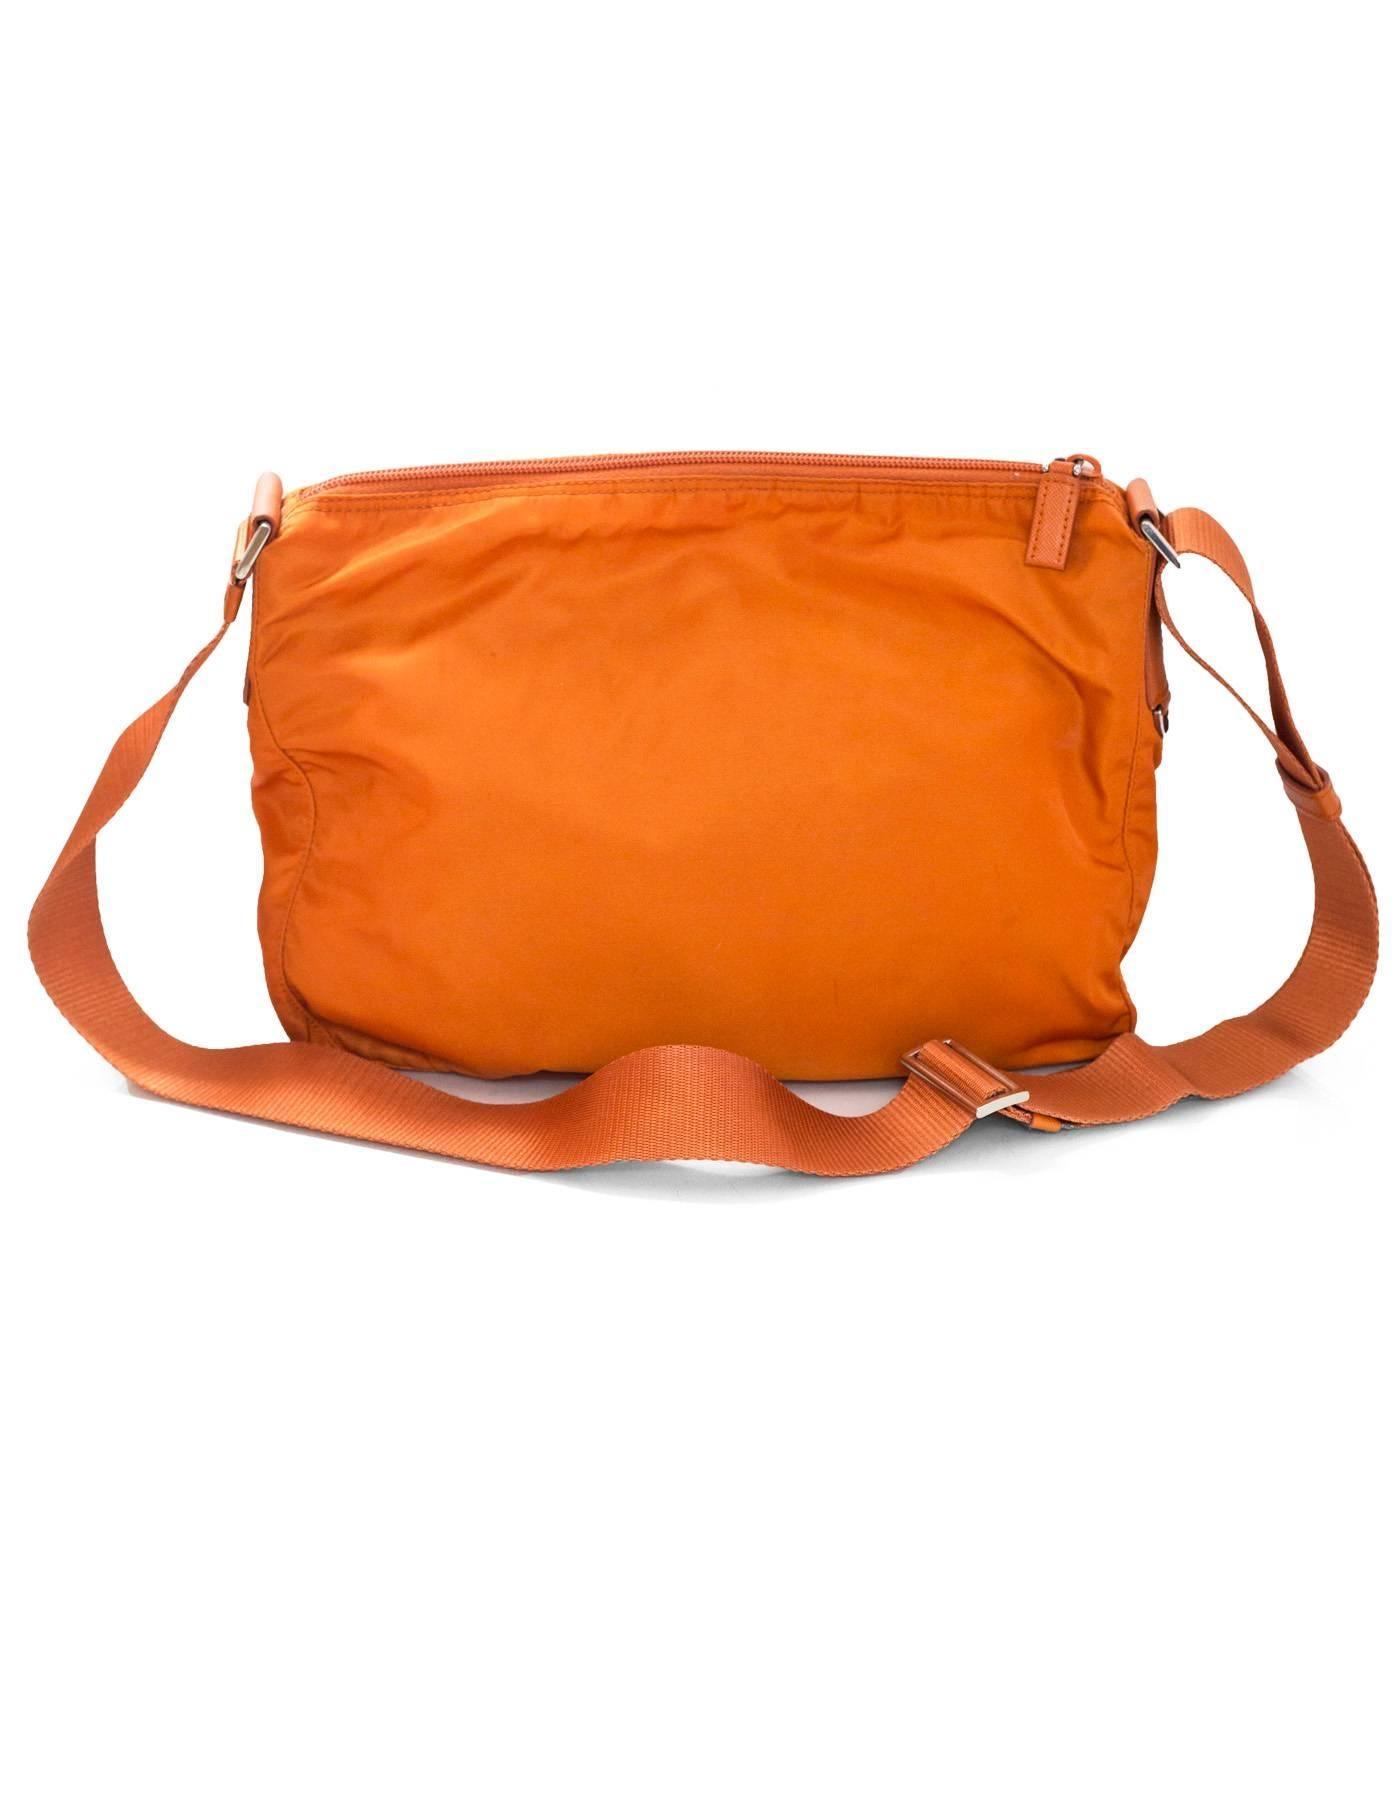 1f6cfca0b77c ... sweden prada orange tessuto nylon messenger crossbody bag in excellent  condition for sale in new york